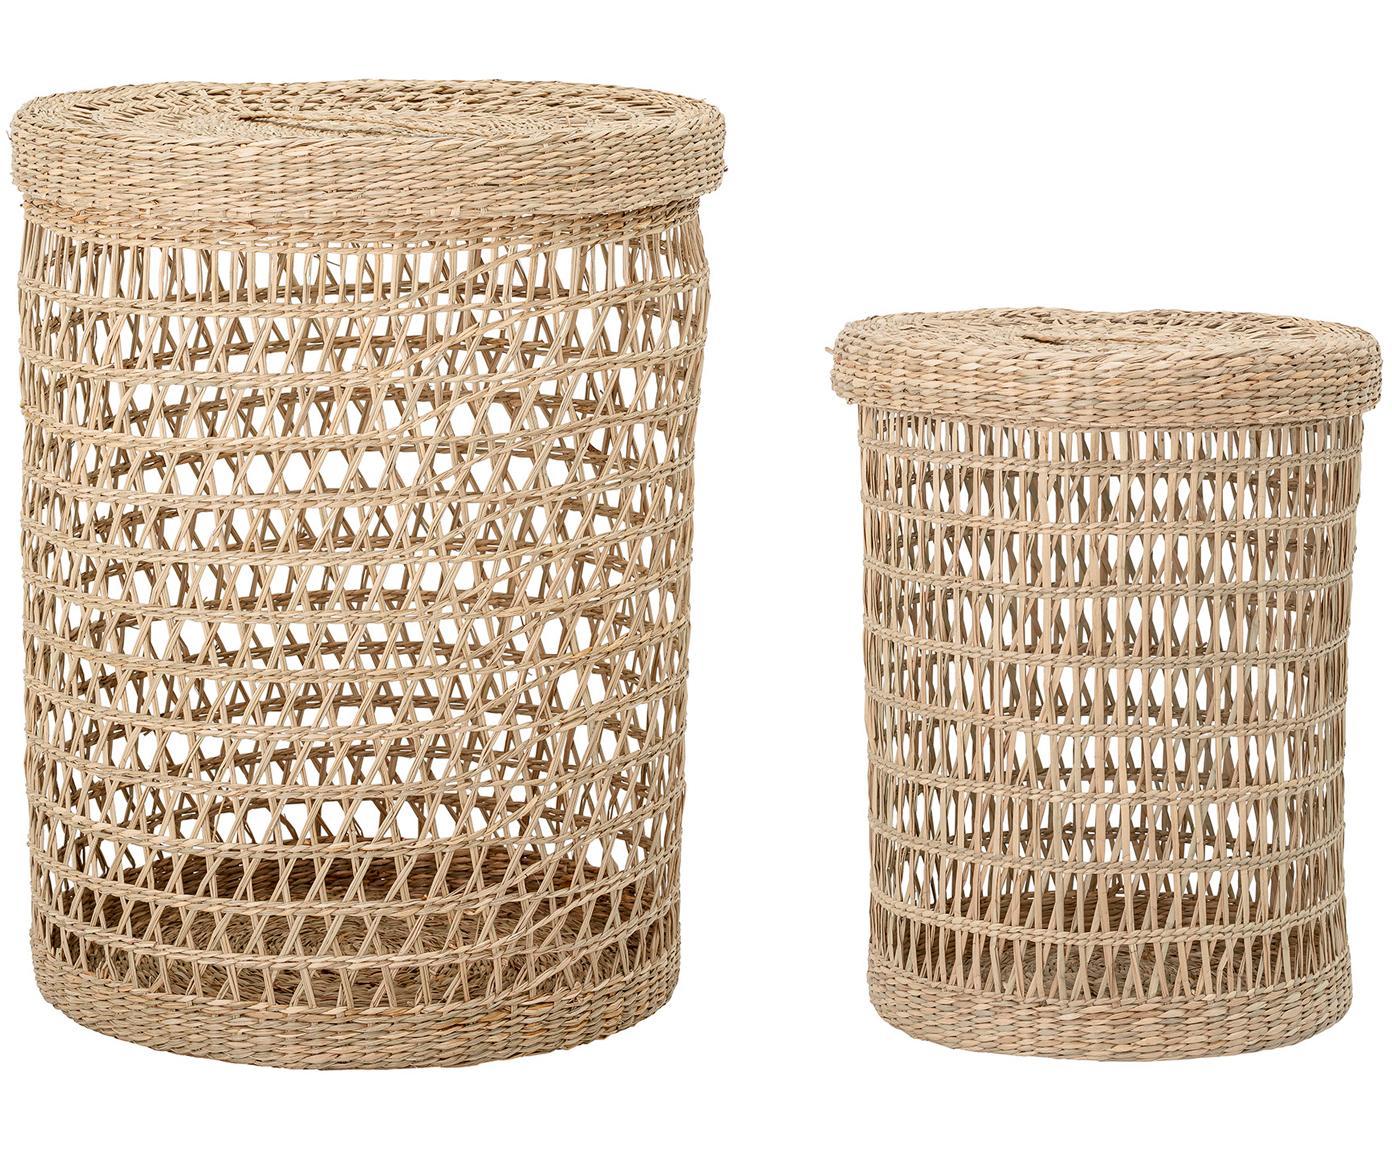 Set de cestas Beta, Fibra natural, Beige, Tamaños diferentes